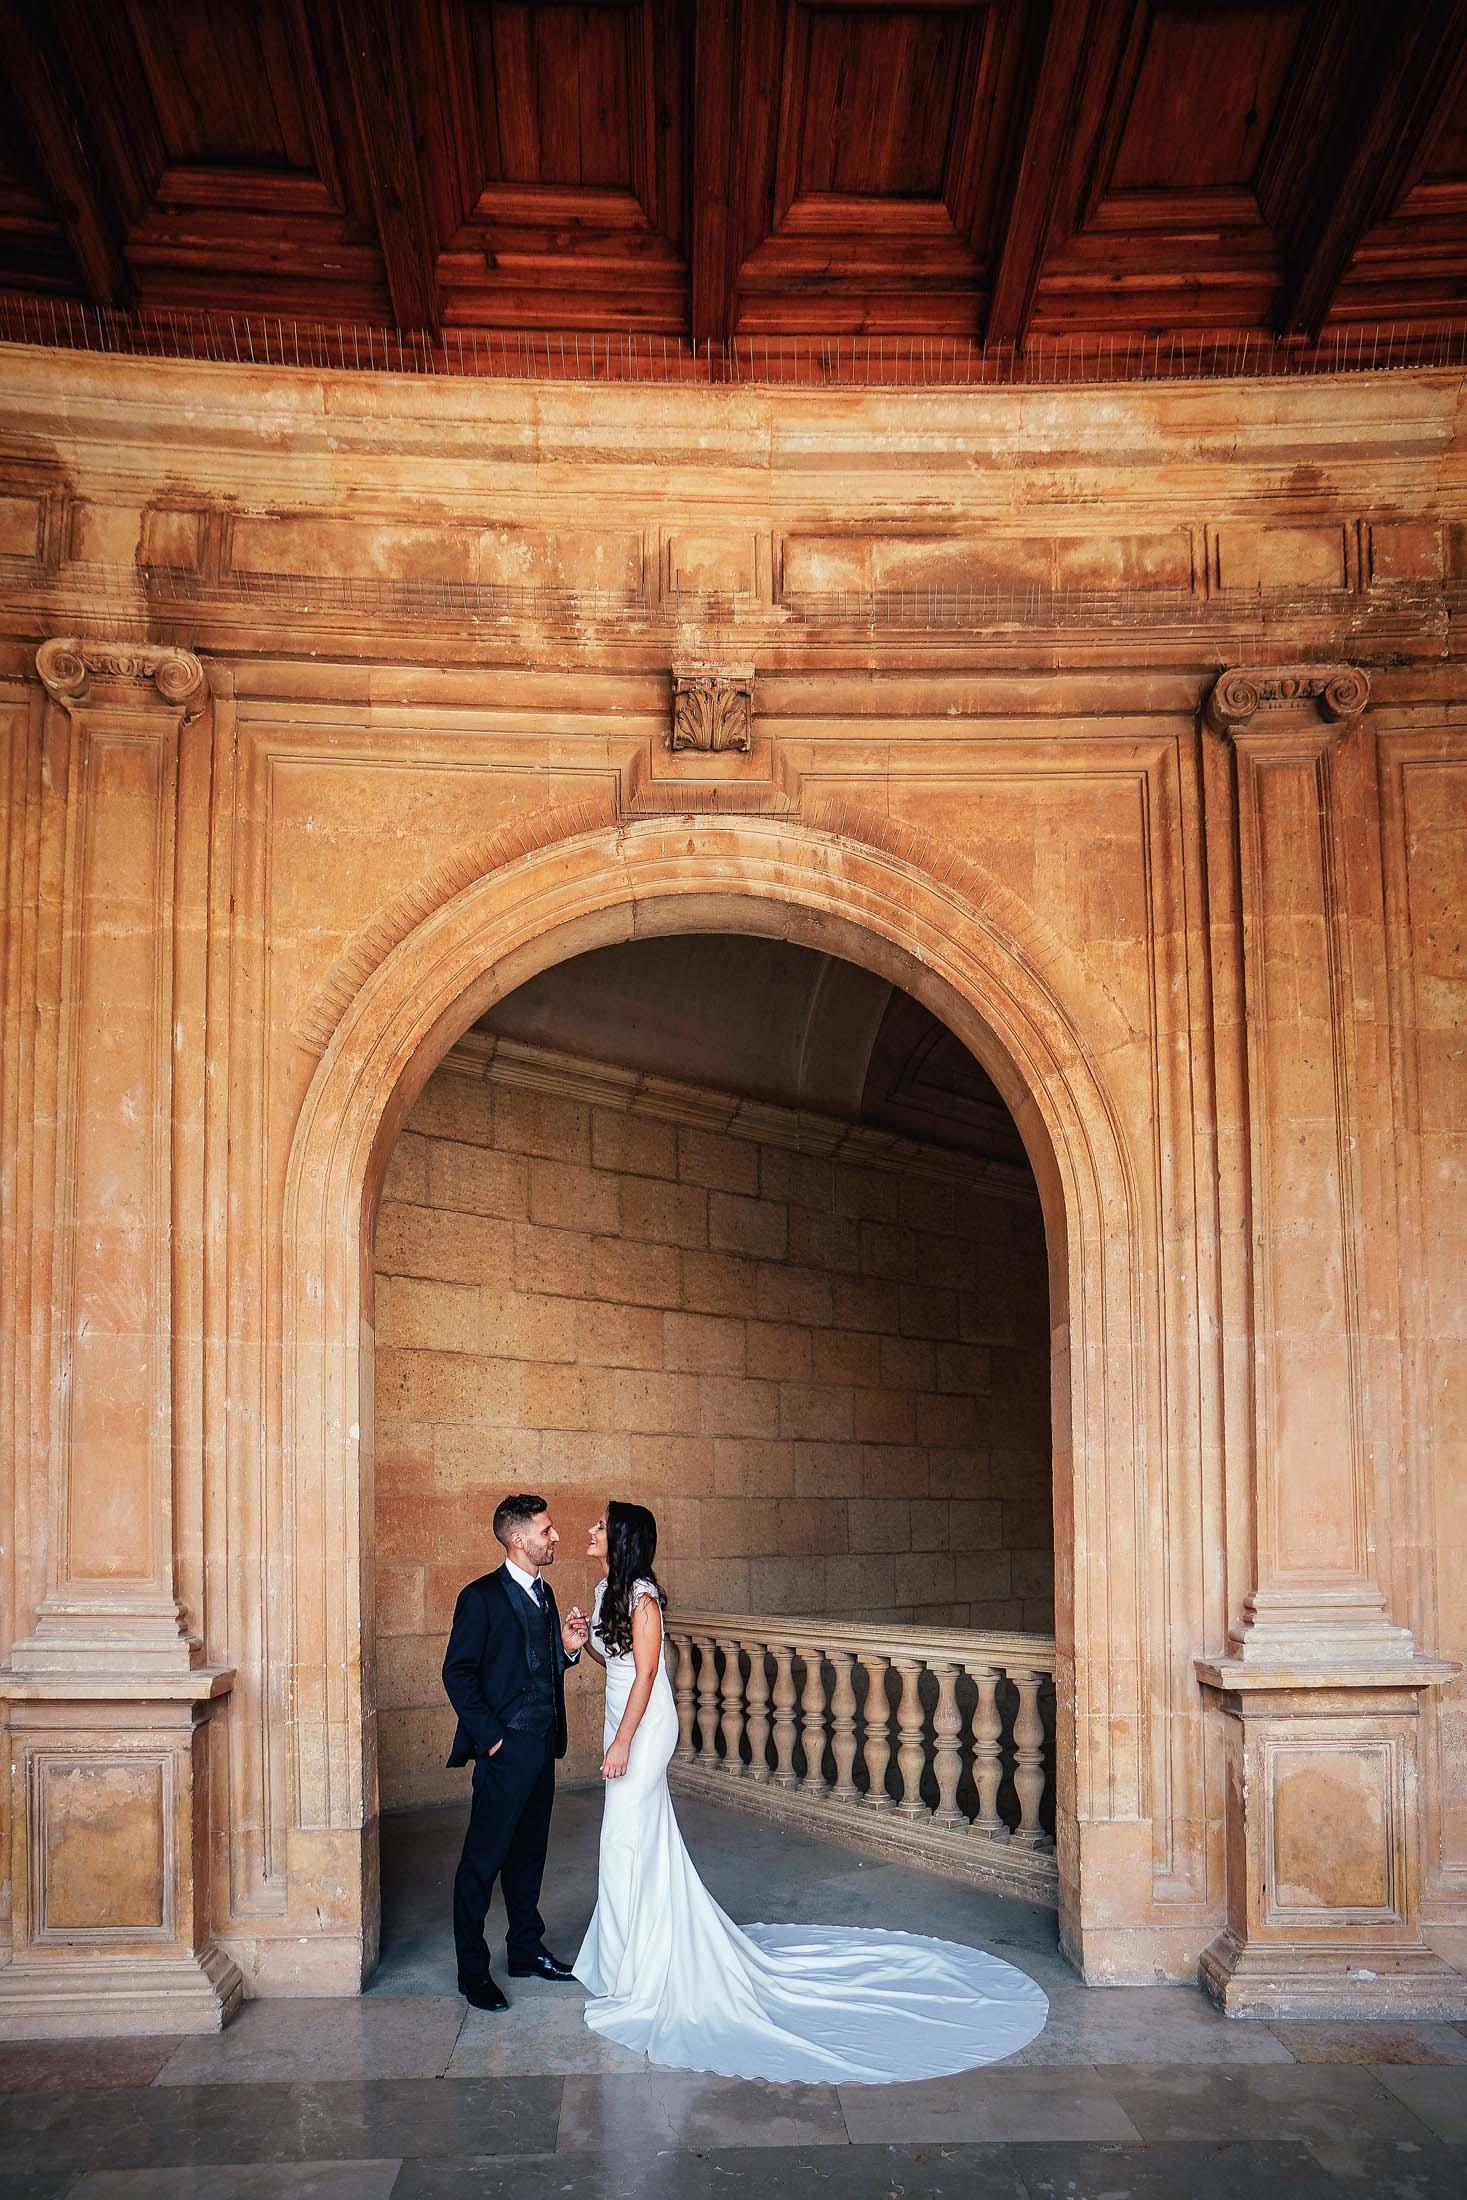 Sesión de post boda en alhambra